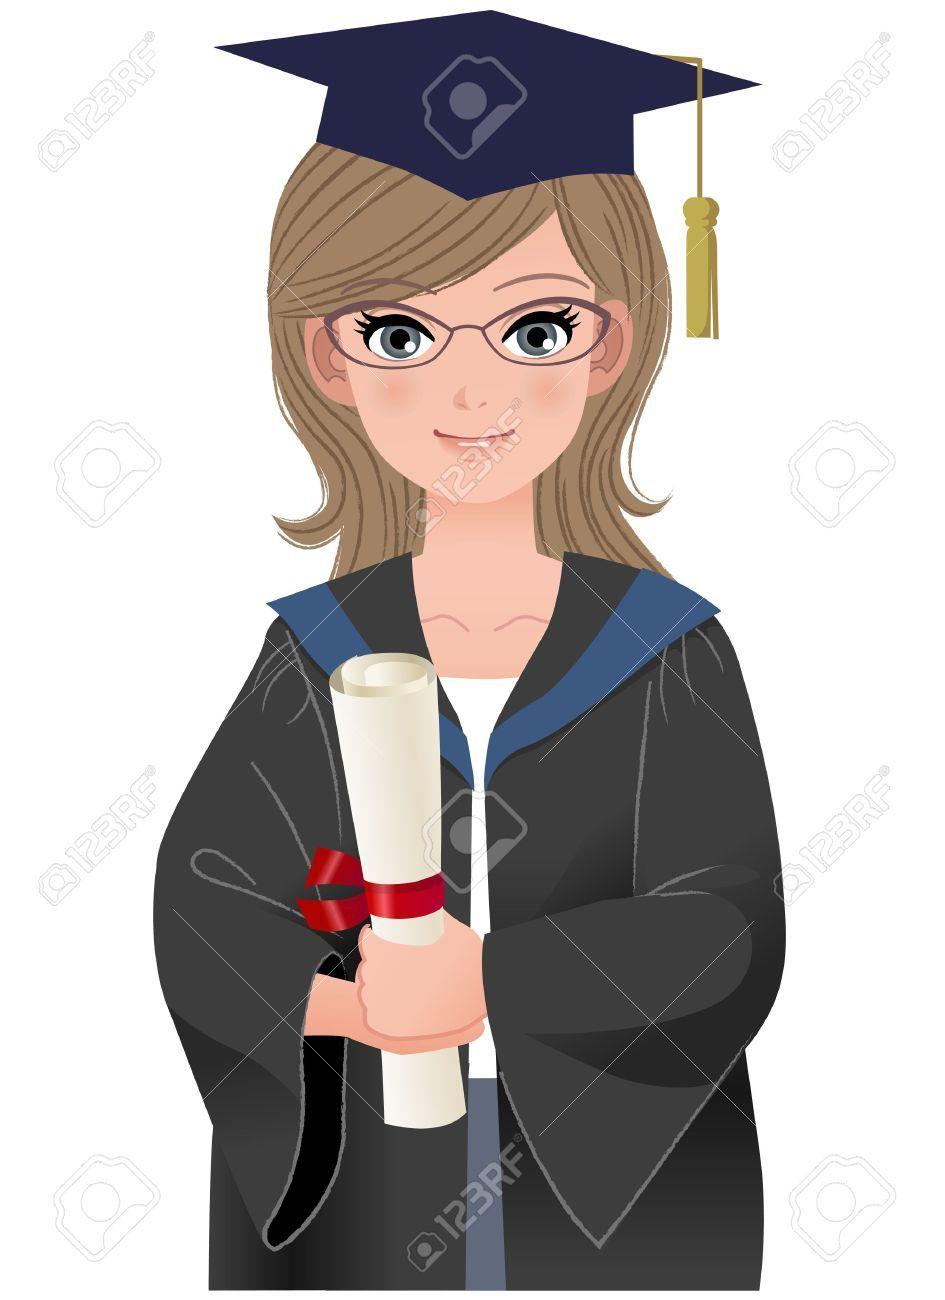 graduating college clipart